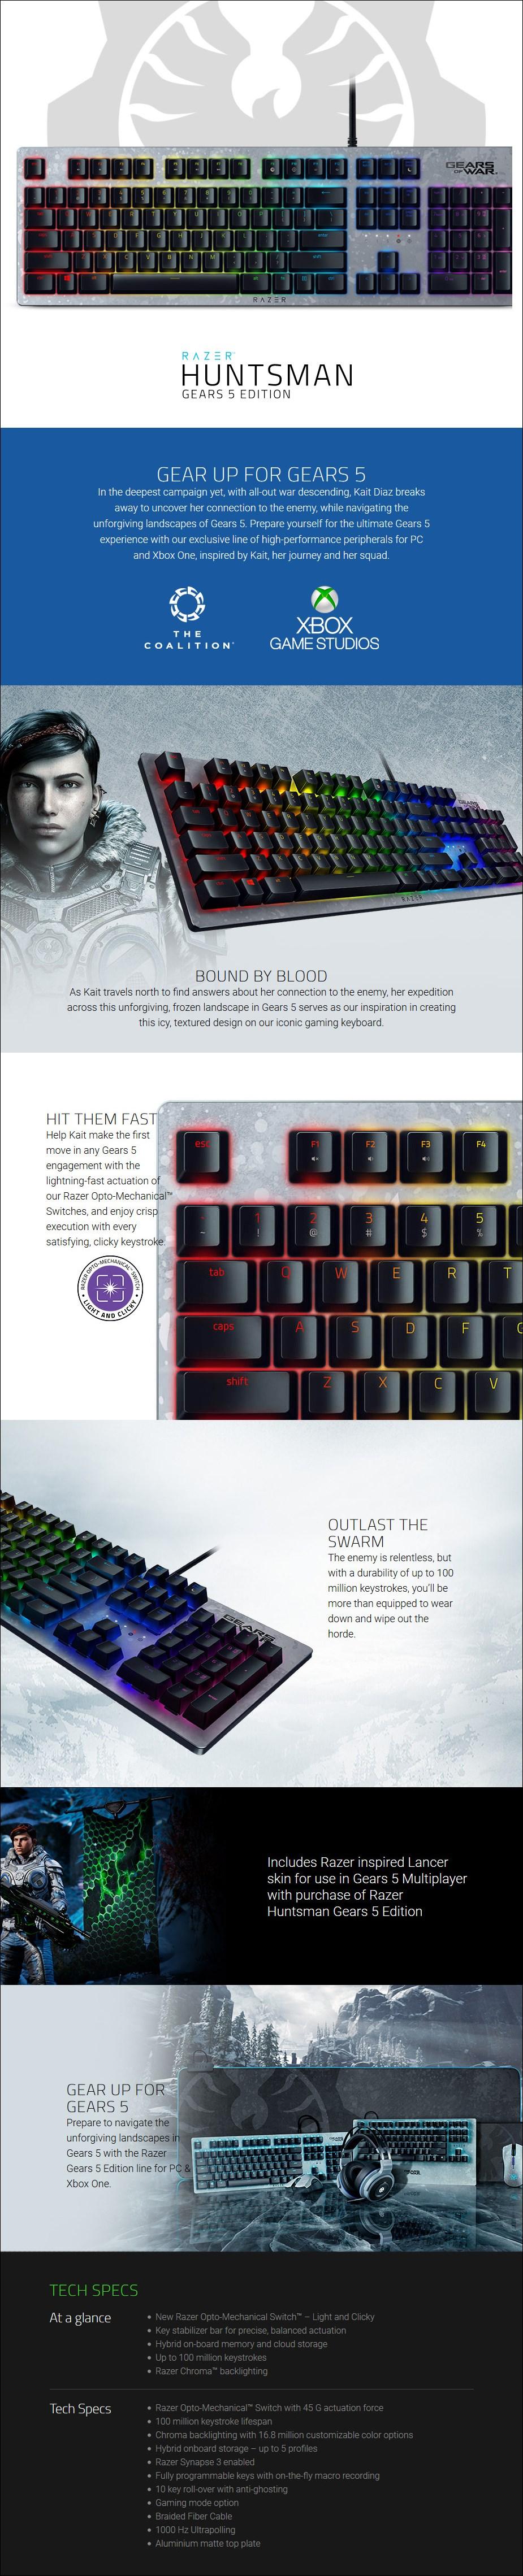 Razer Huntsman Elite Opto-Mechanical Gaming Keyboard - Gears 5 Edition - Overview 1